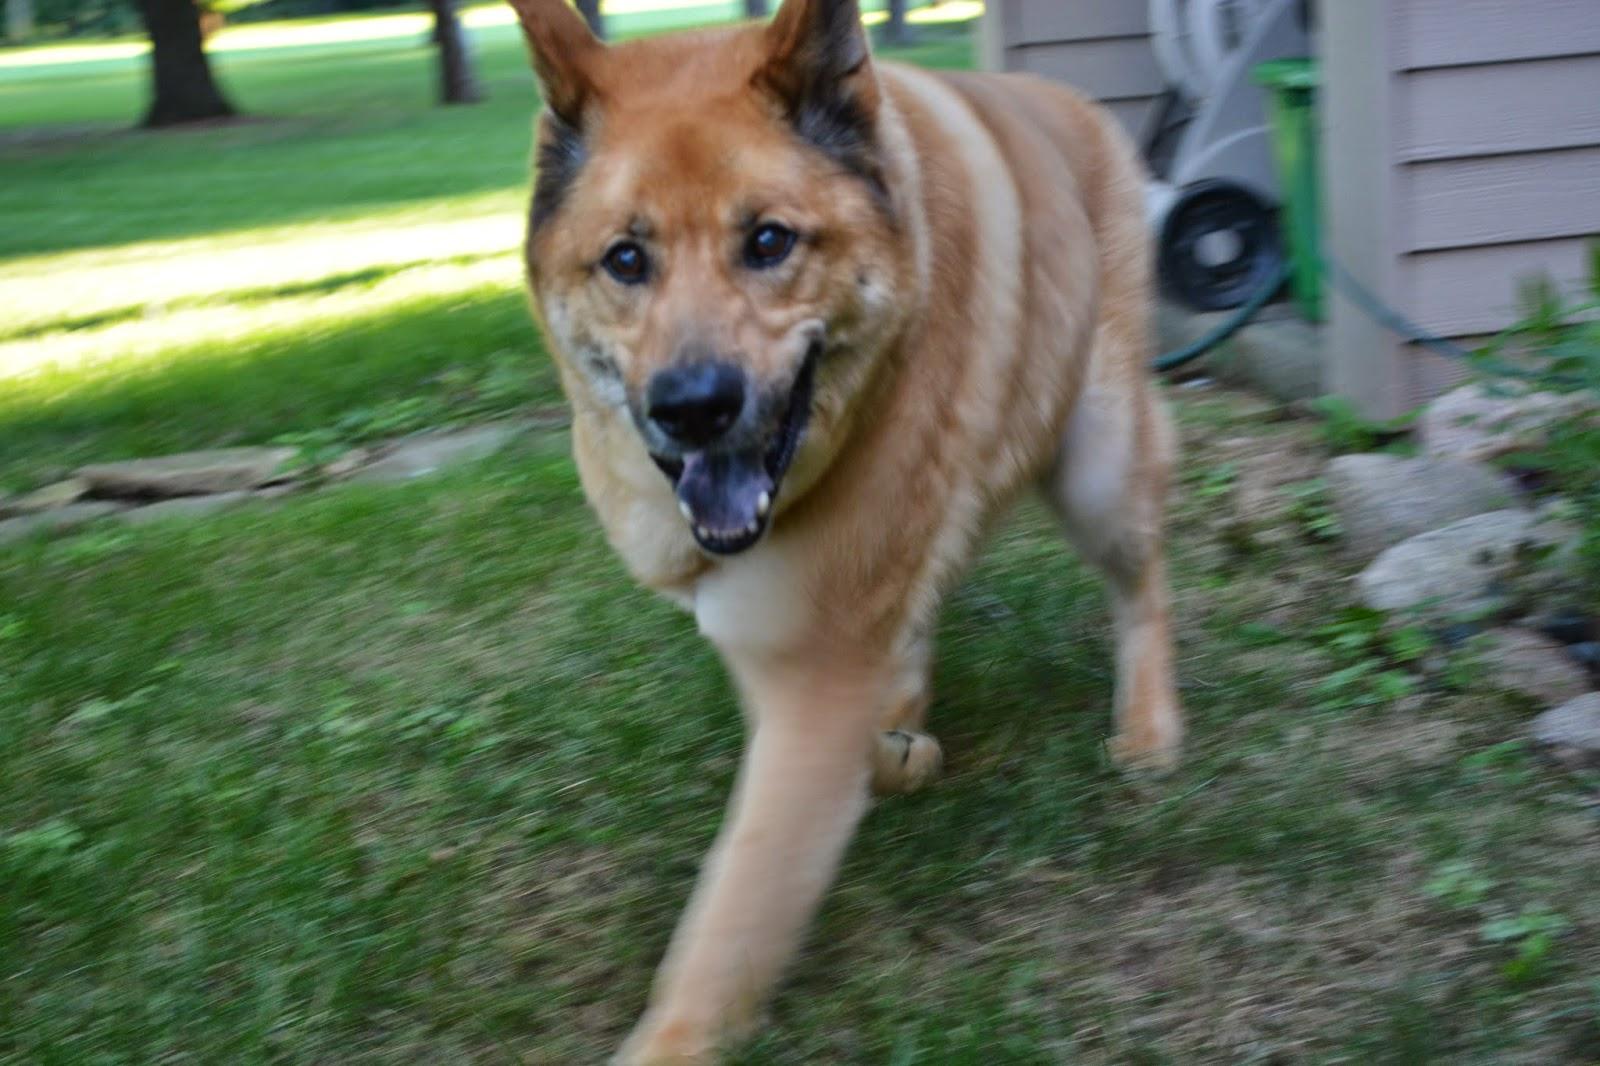 Kody dog running towards camera on a green landscaped lawn